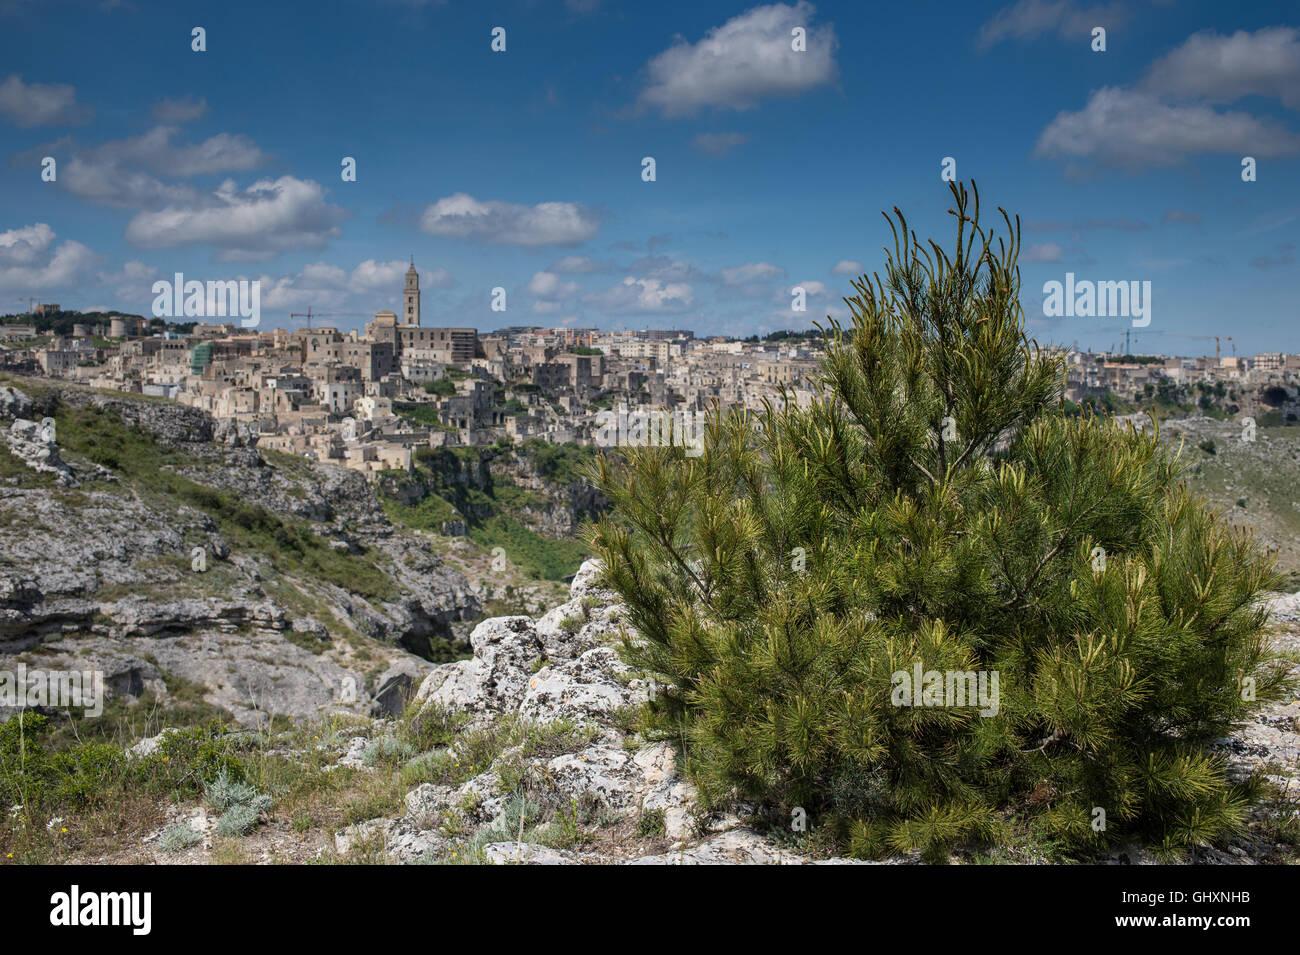 Creeping pine or dwarf mountainpine Pinus mugo, Pinaceae, Matera, Basilicata, Italy - Stock Image